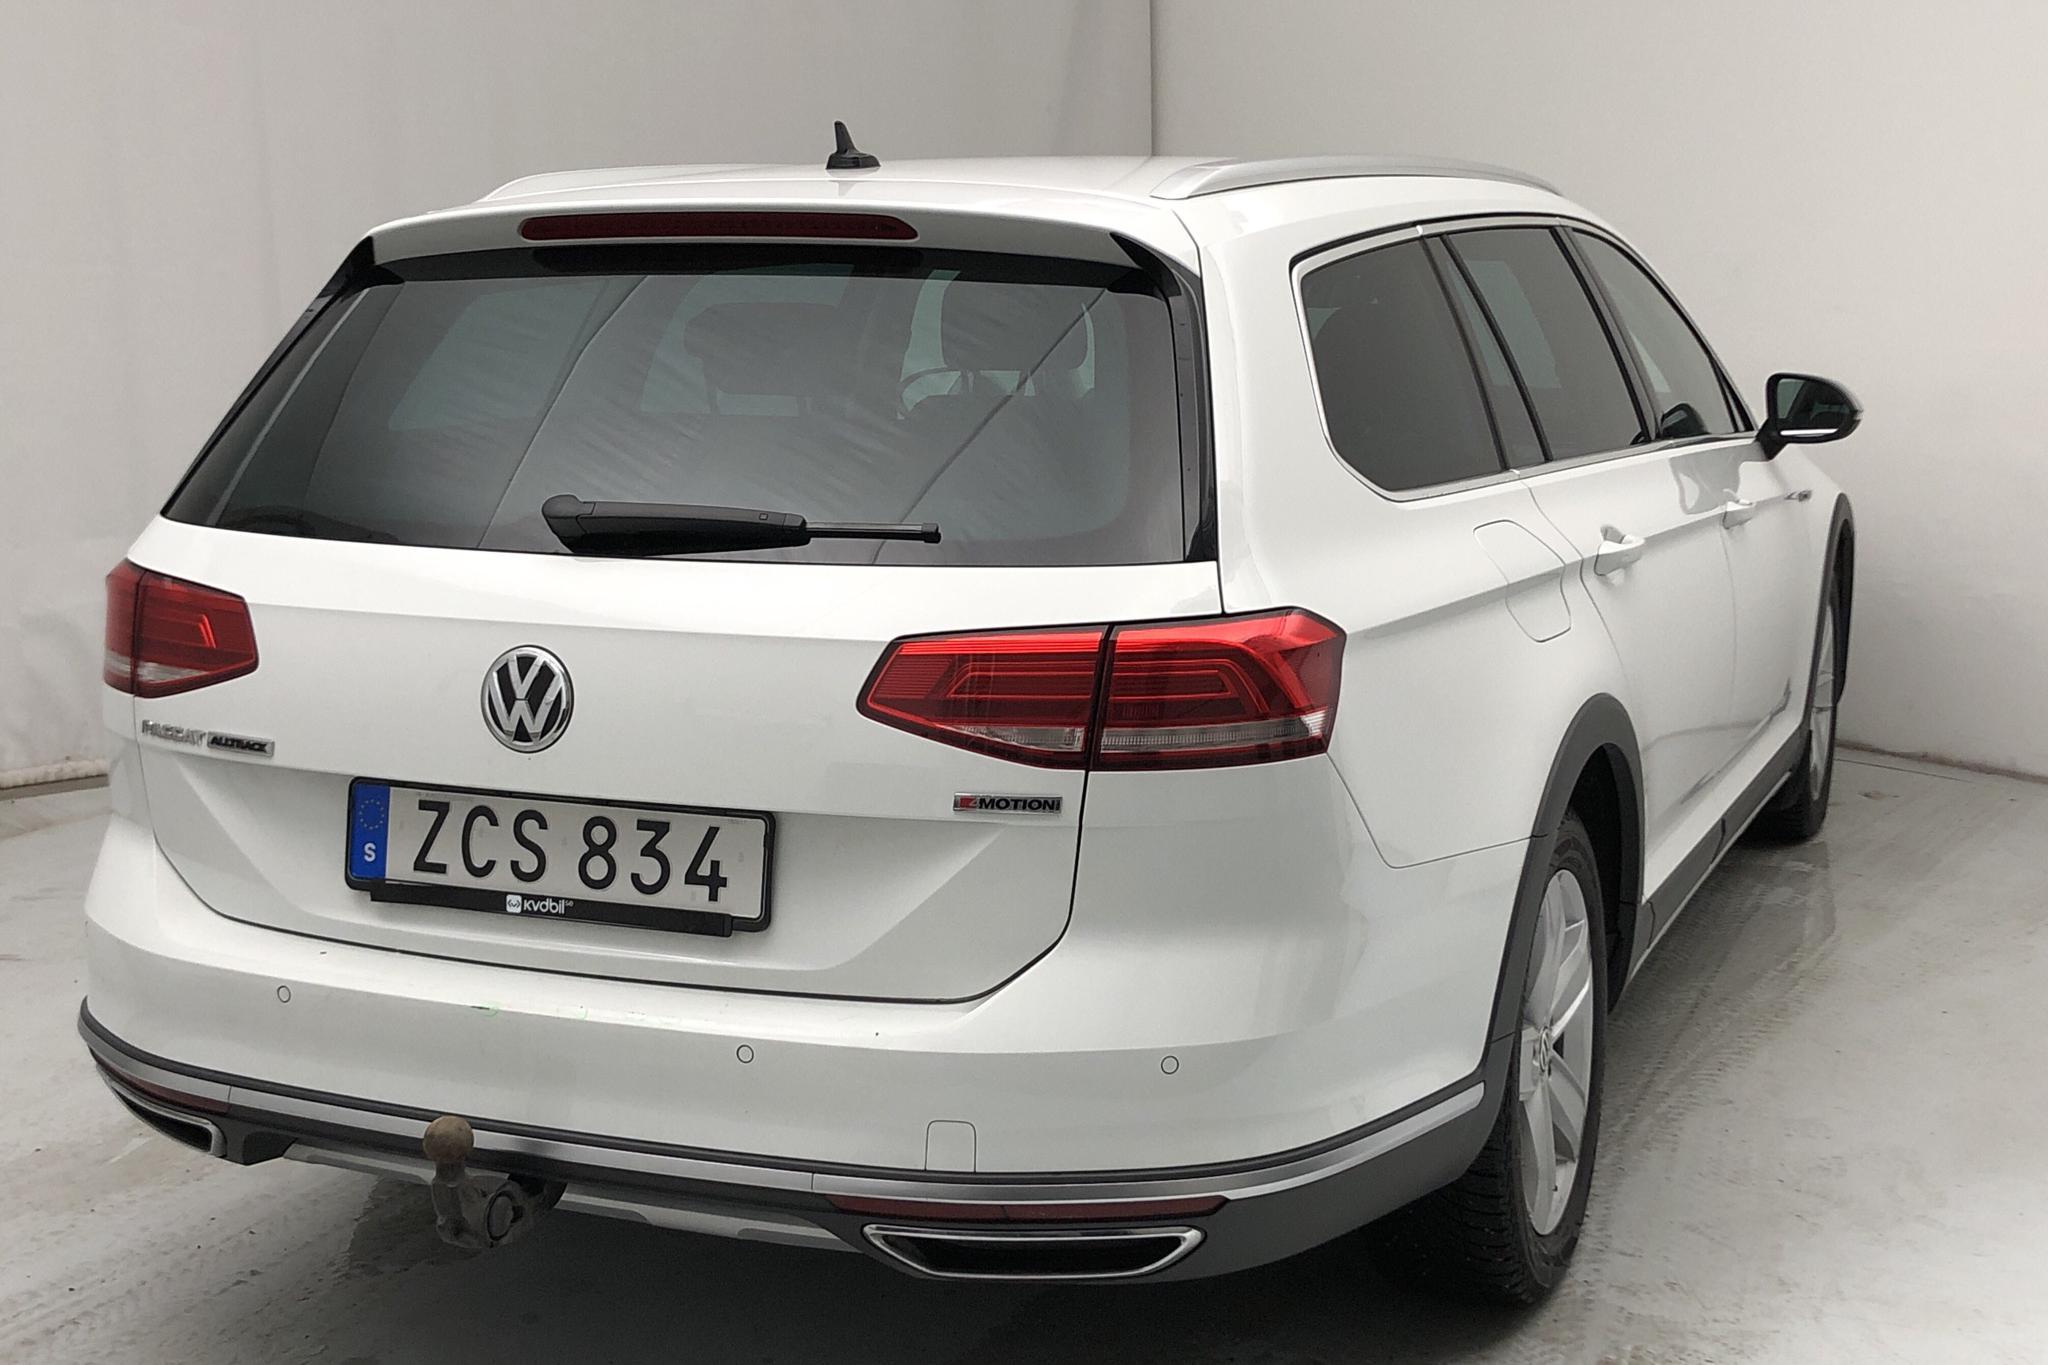 VW Passat Alltrack 2.0 TDI Sportscombi 4MOTION (190hk) - 11 113 mil - Automat - vit - 2018